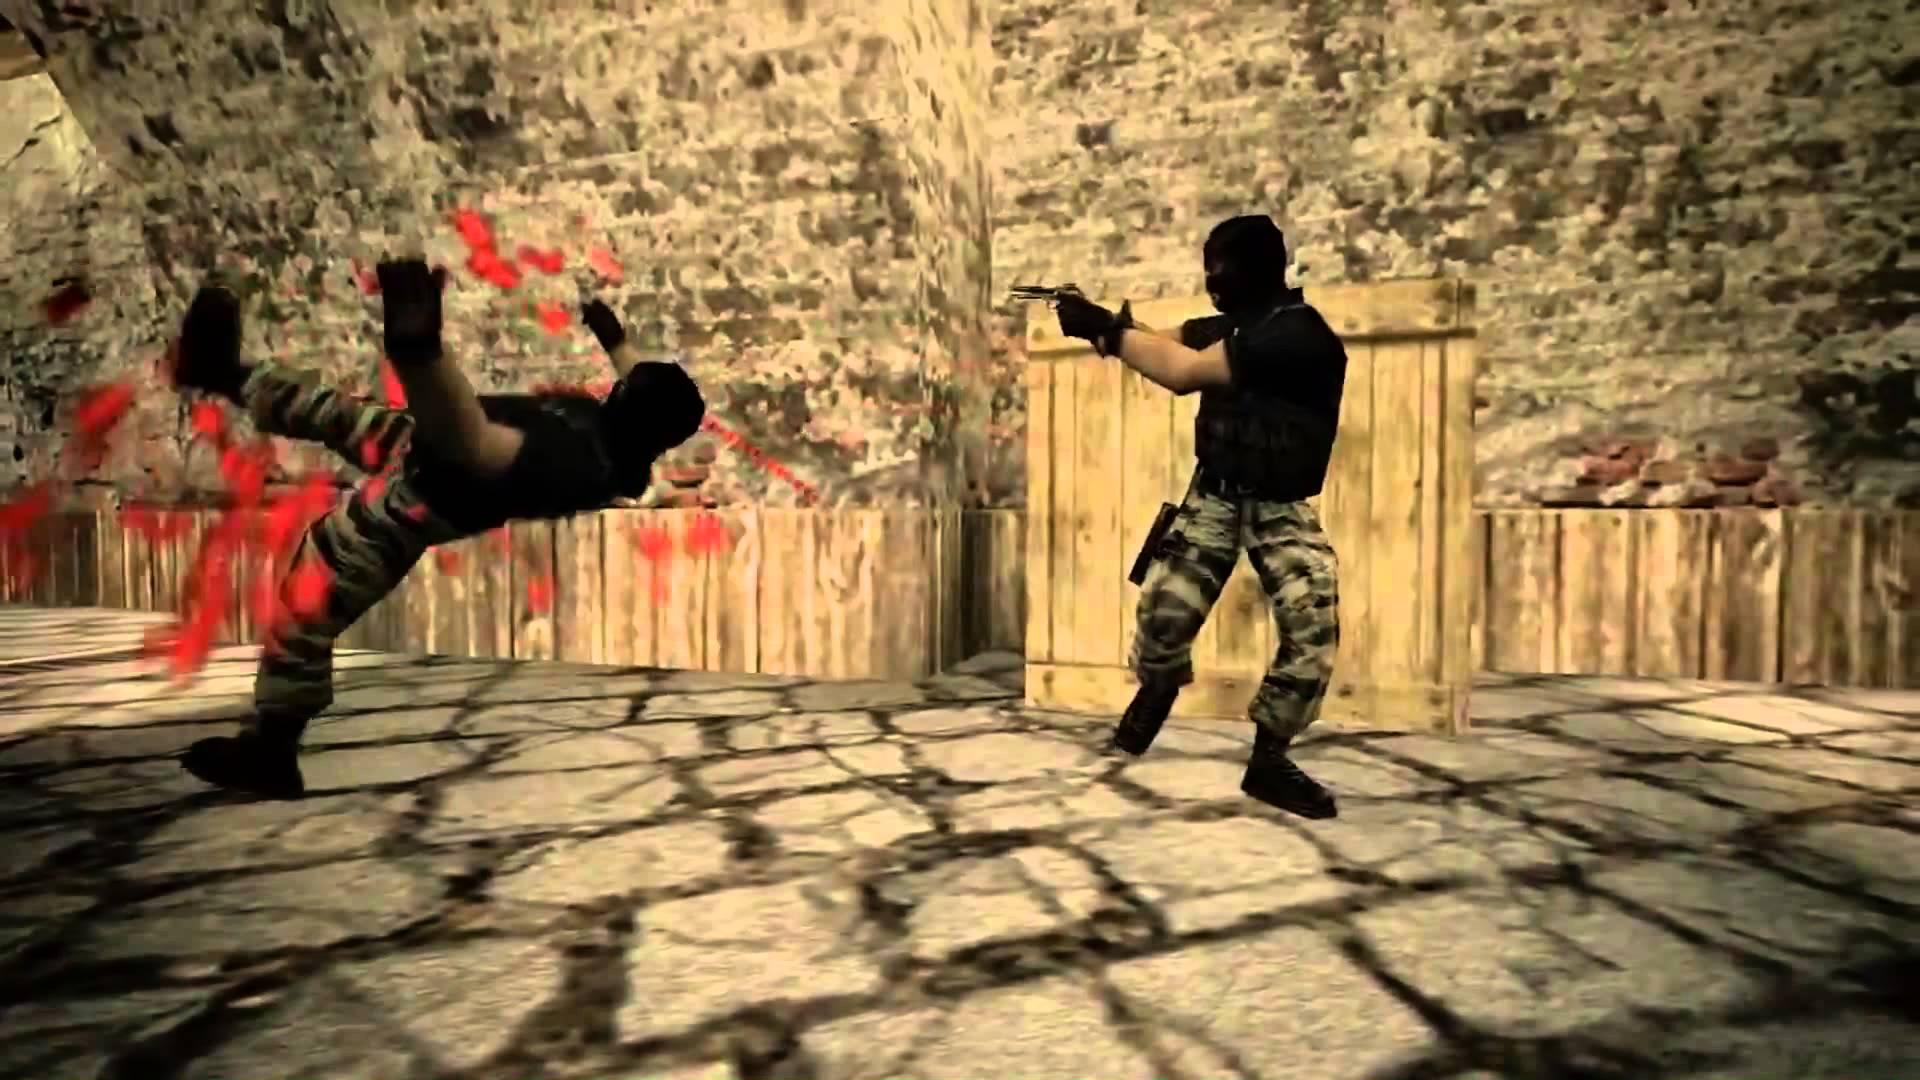 Counter Strike 1 6 Wallpaper Hd Best Wallpapers Cloud